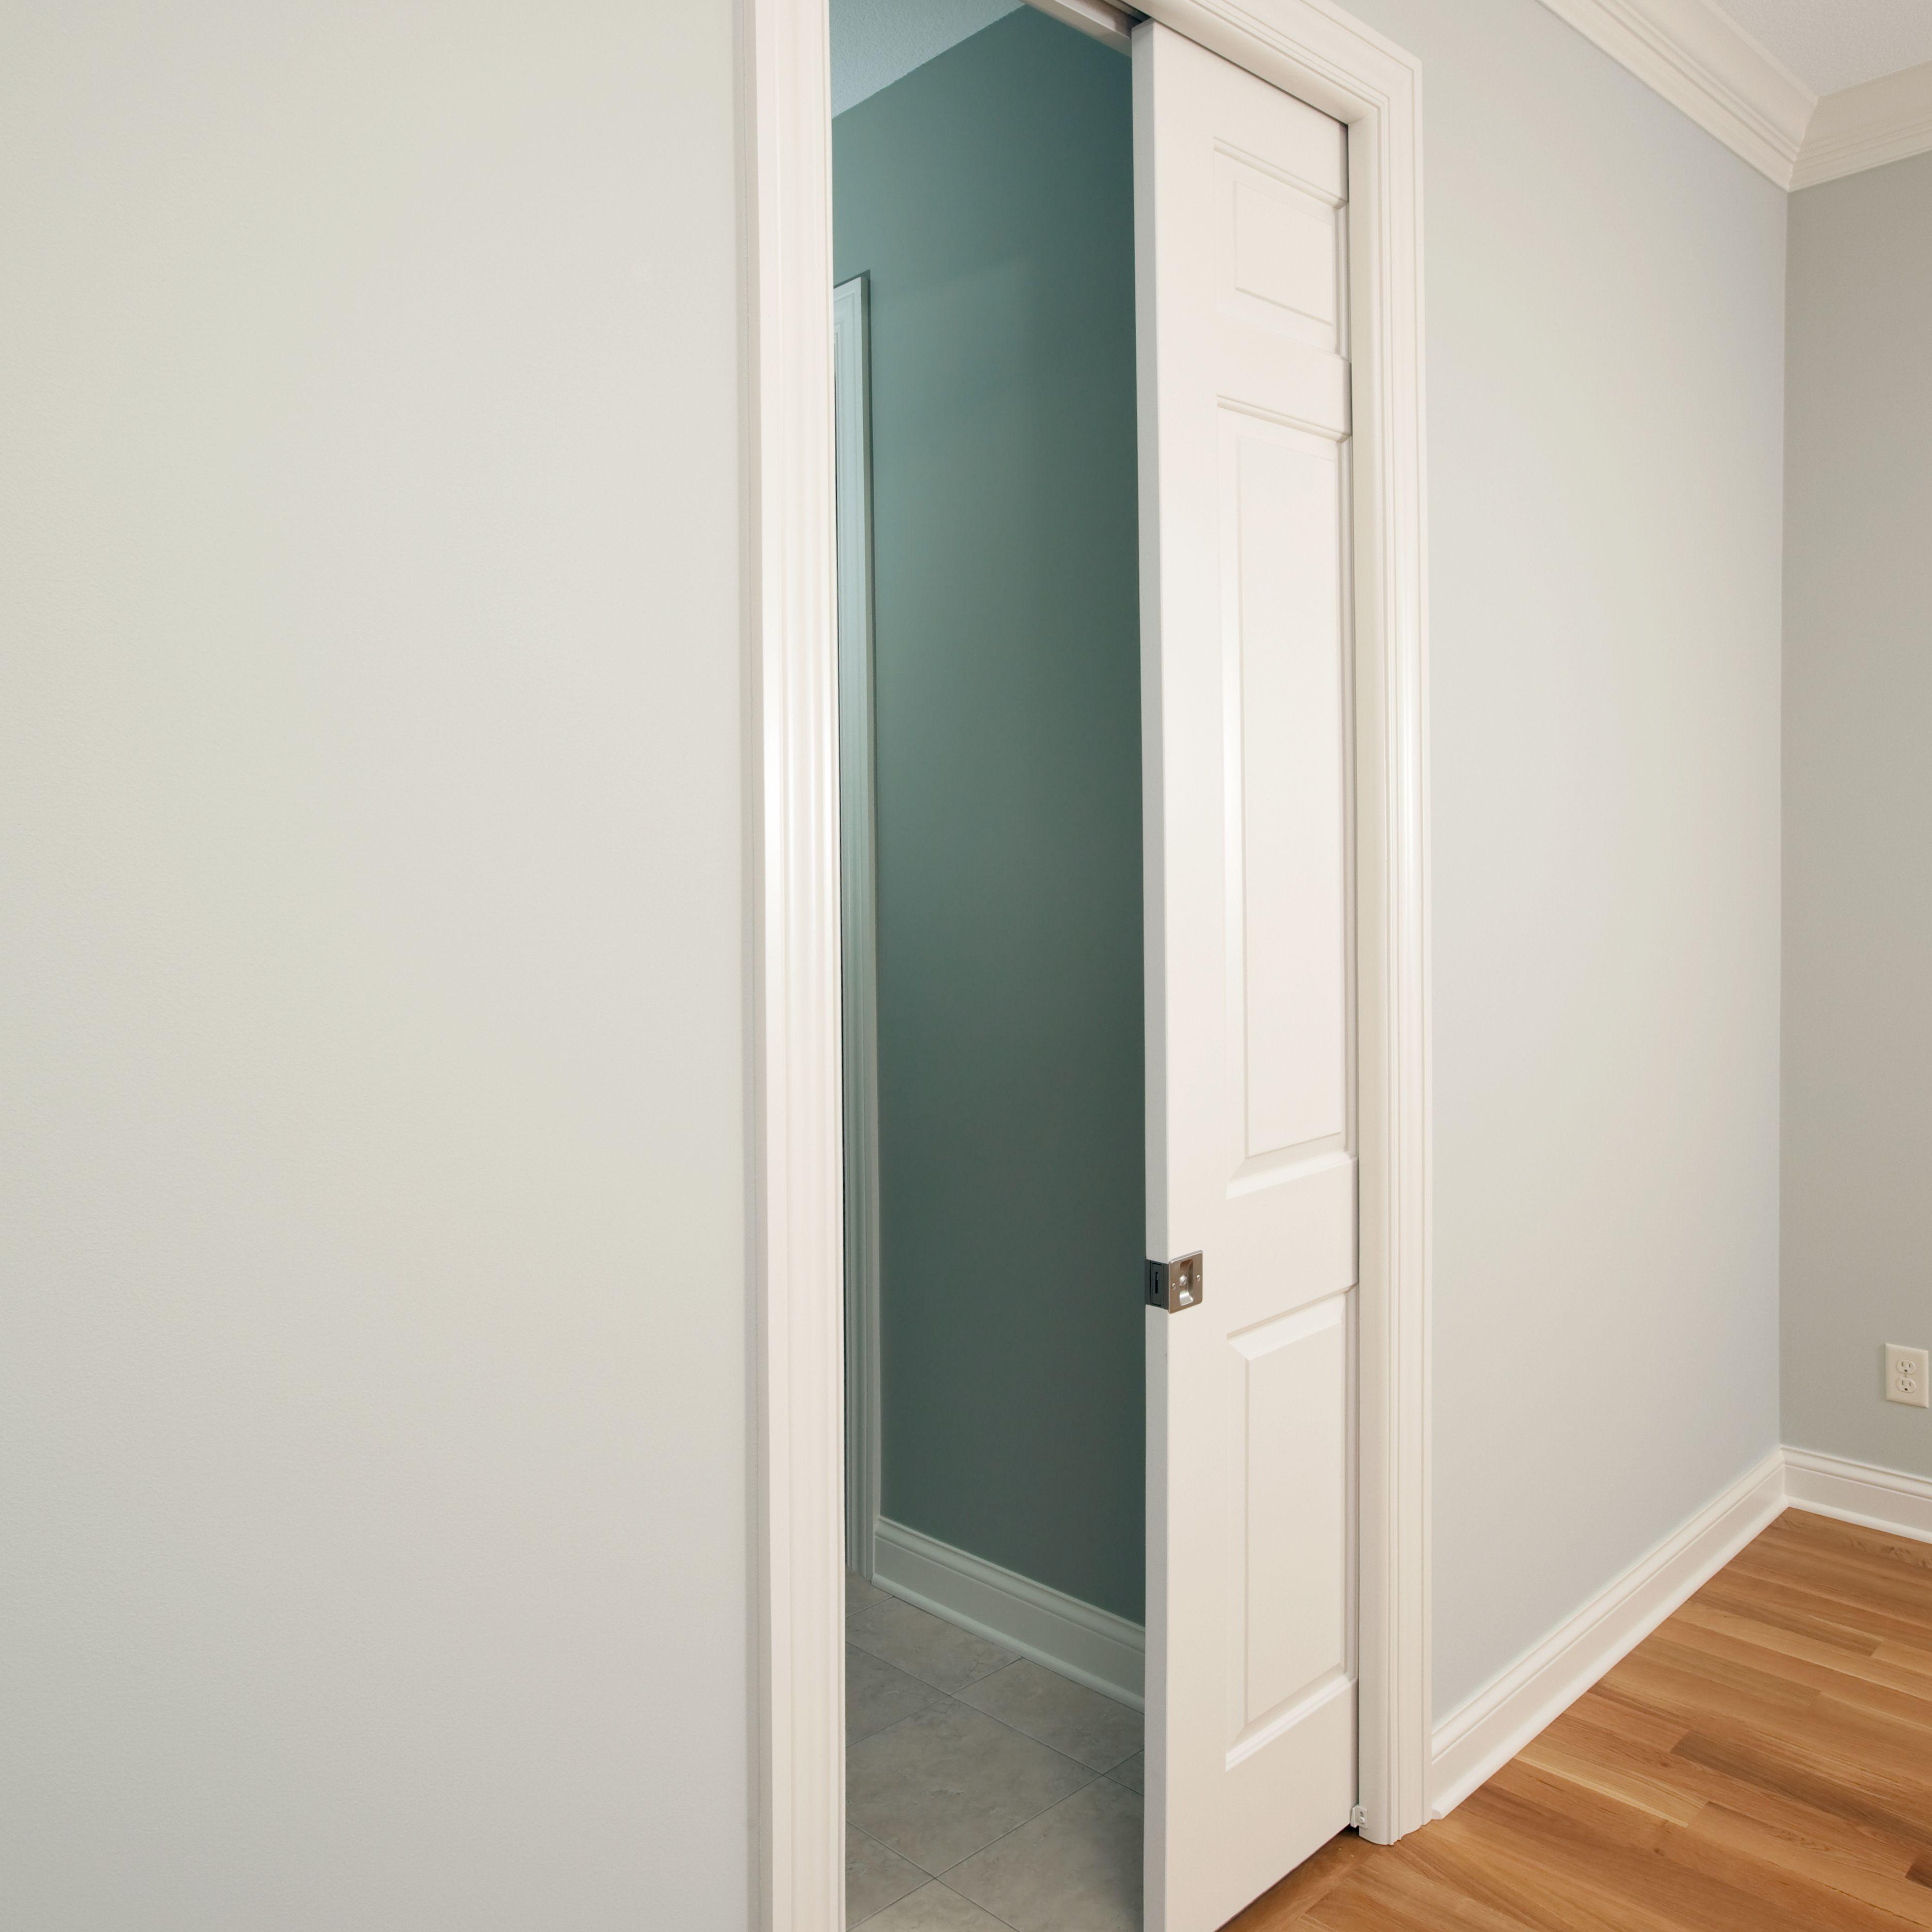 How To Install A Pocket Door